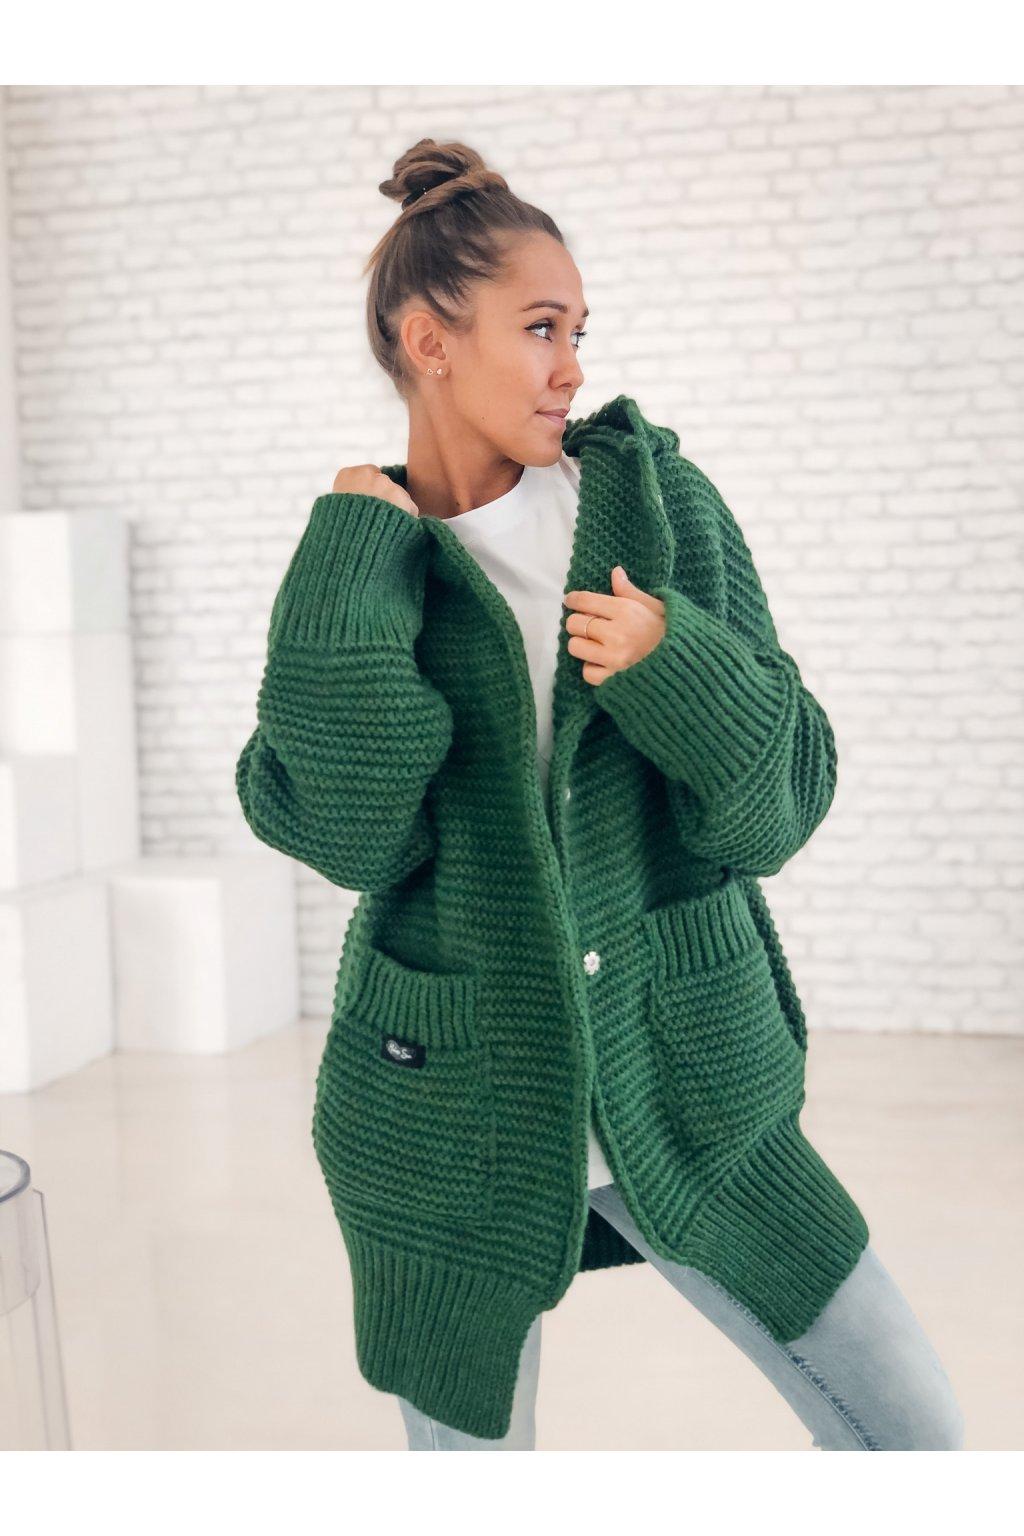 damsky cardigan maxi green eshopat cz 1